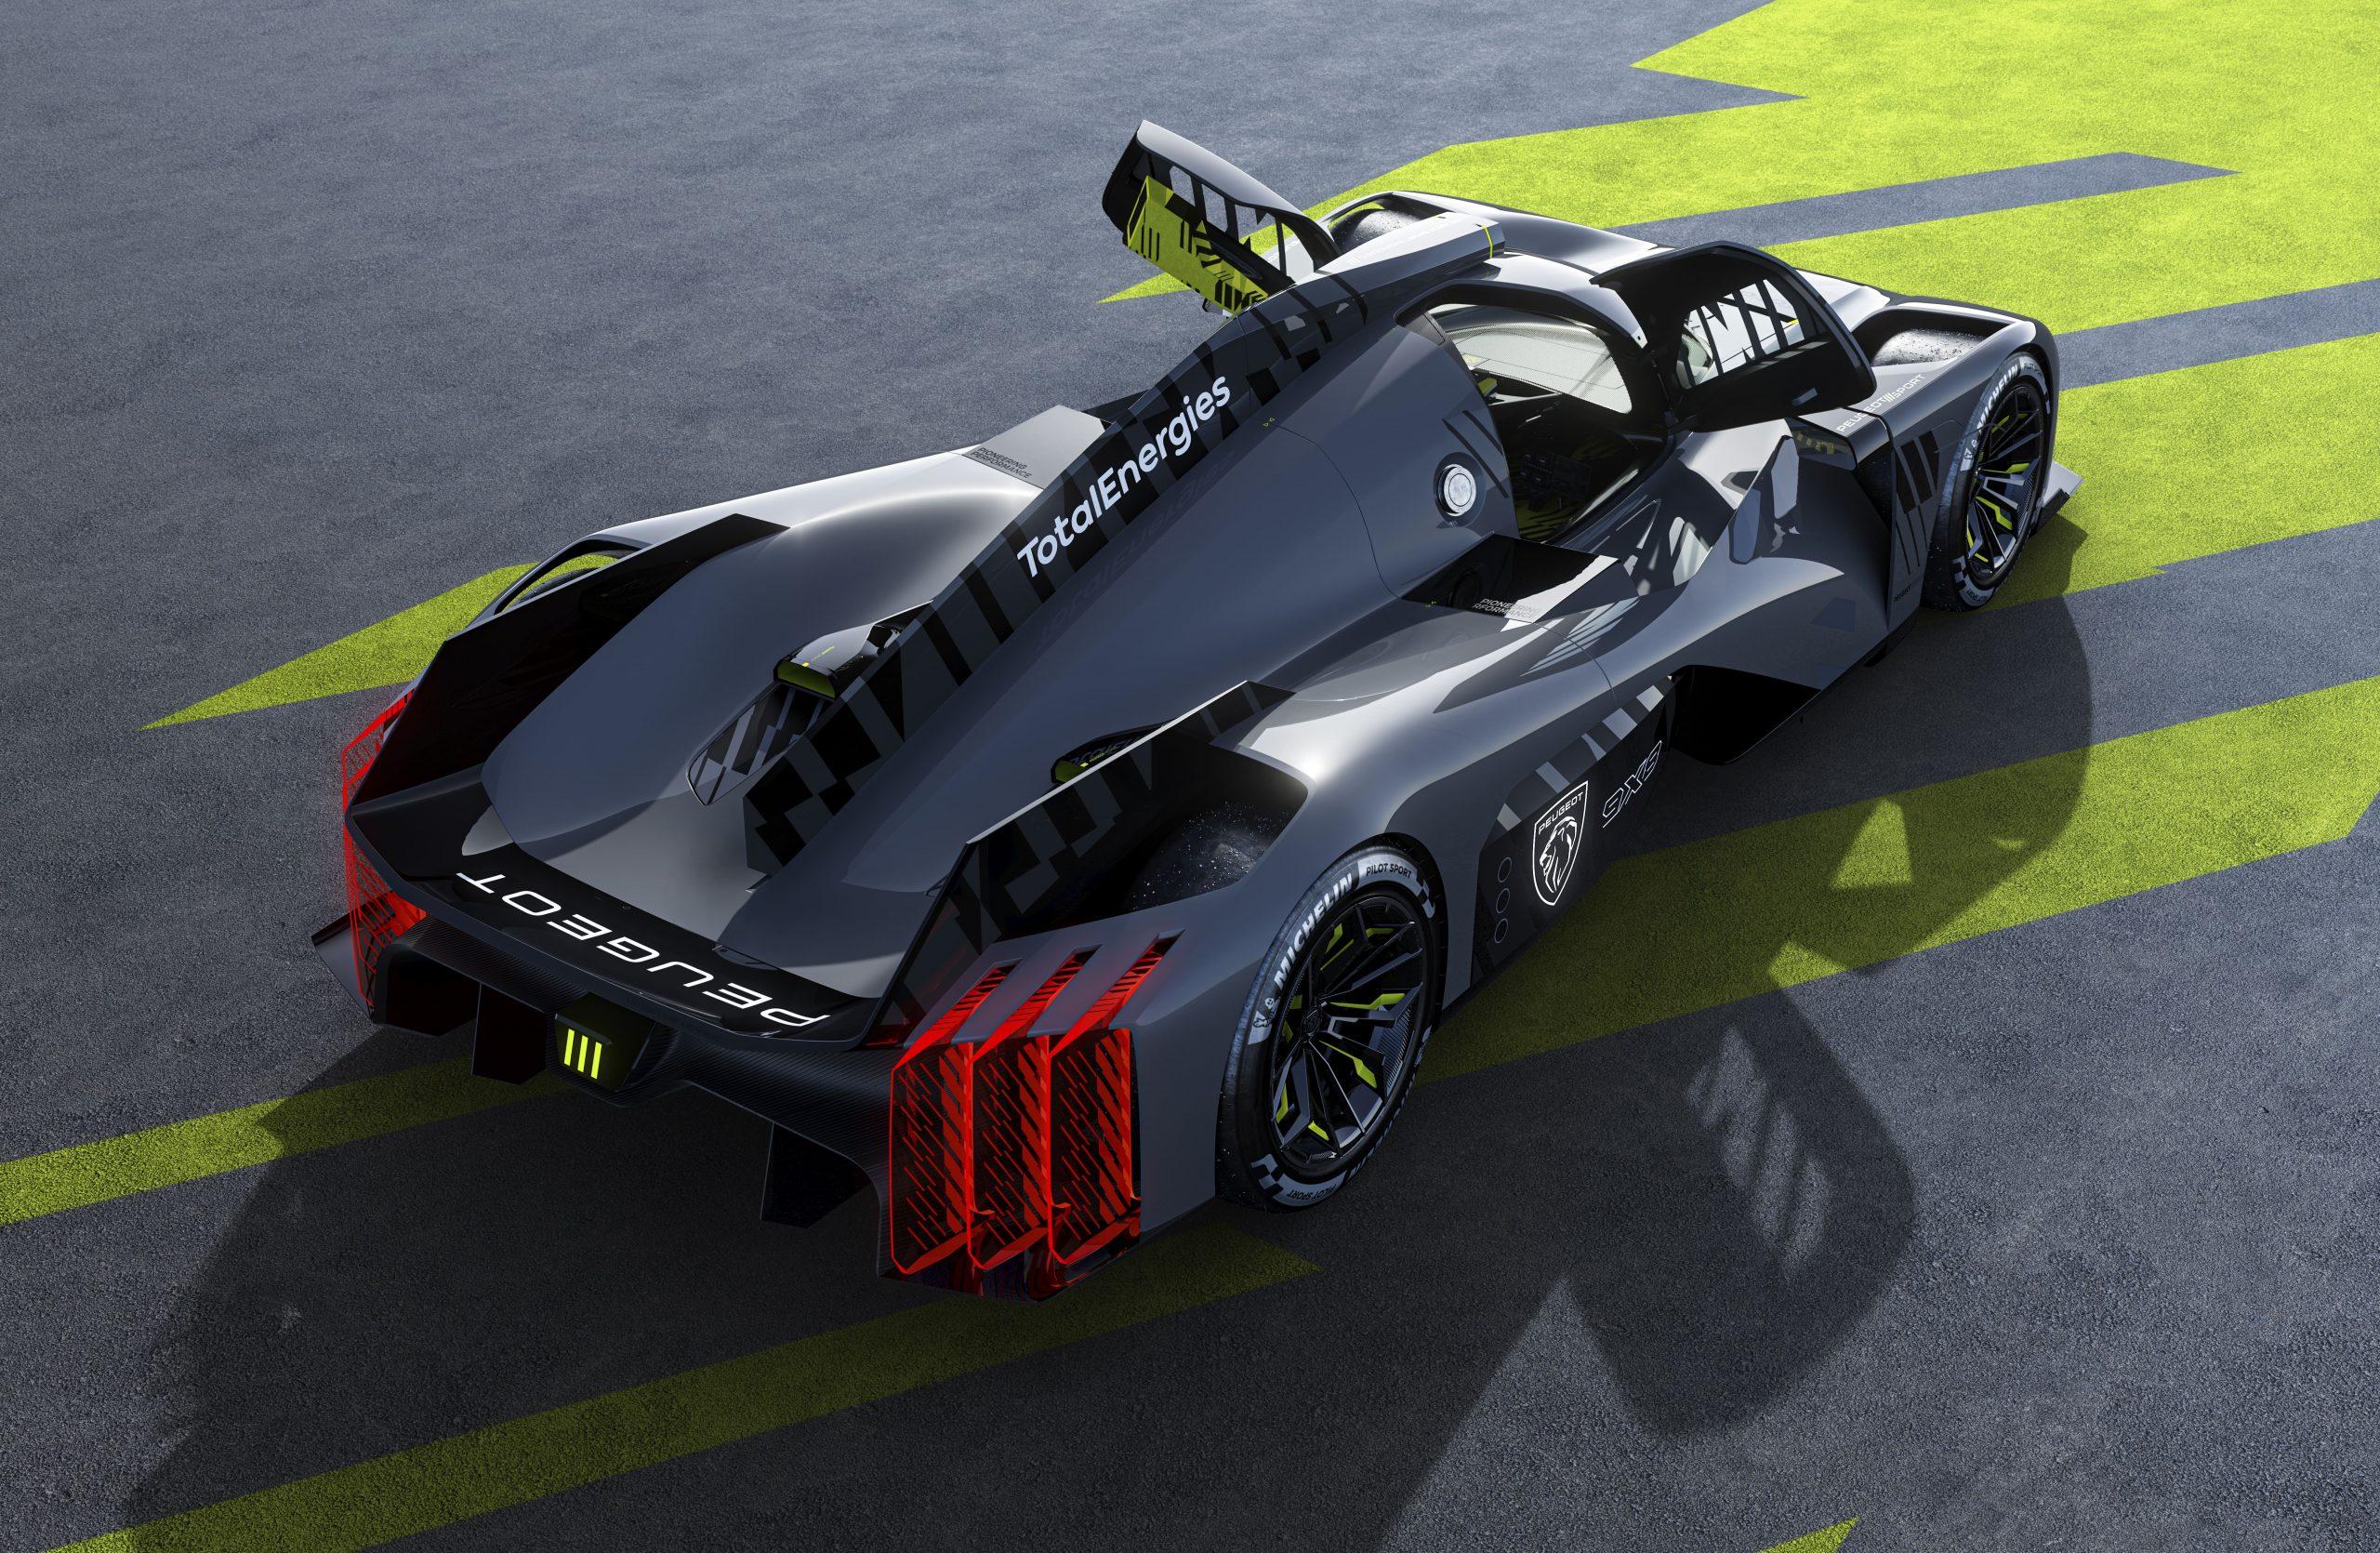 Peugeot Le Mans Hypercar LMH 9X8 WEC entry revealed